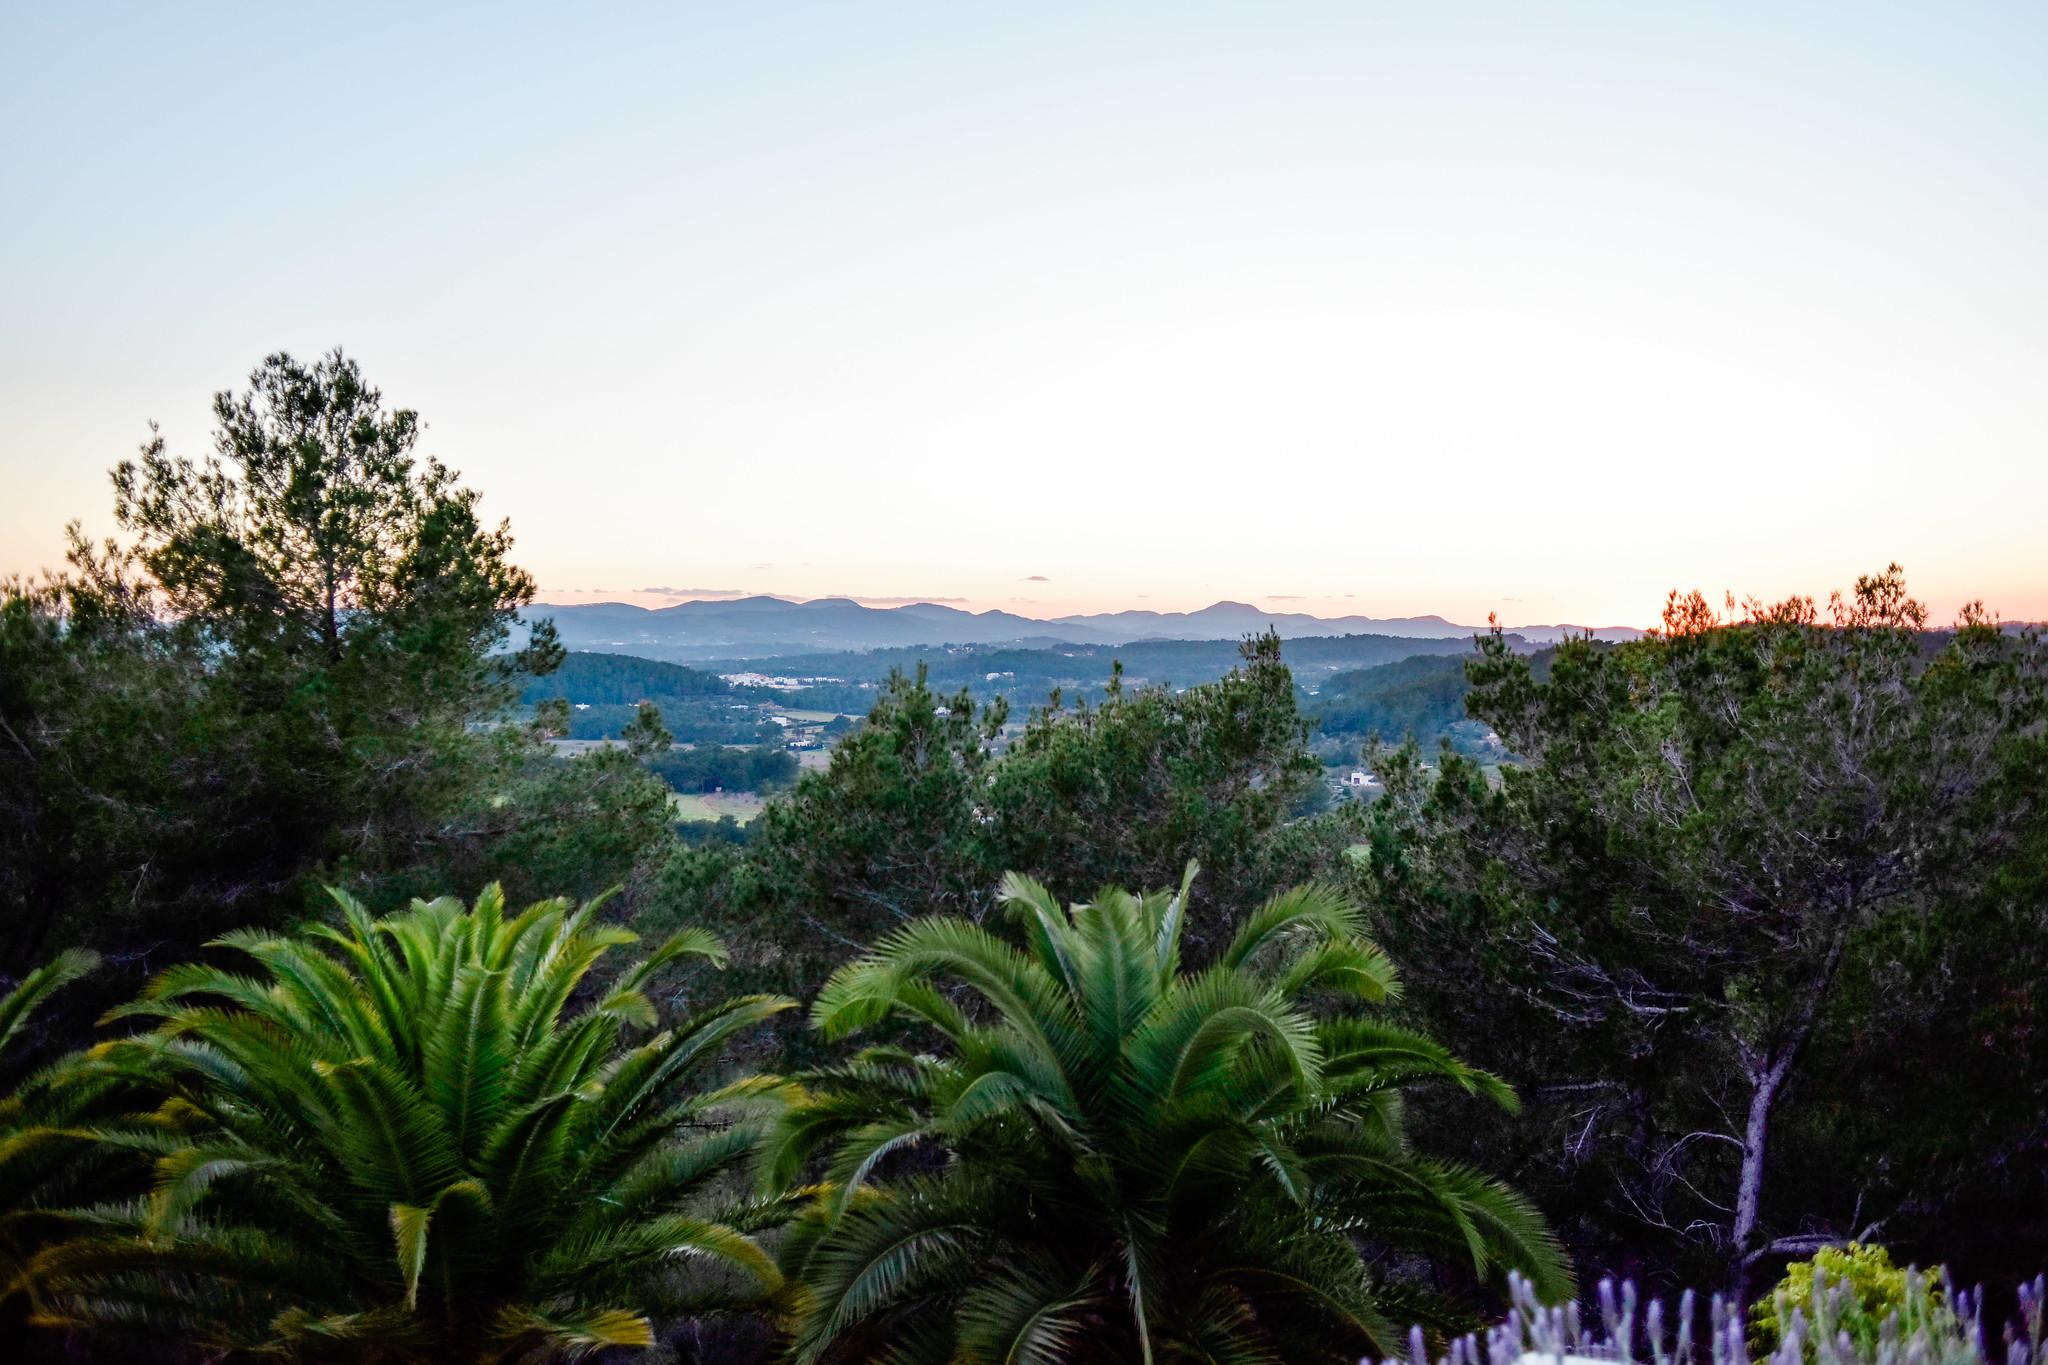 https://www.white-ibiza.com/wp-content/uploads/2020/05/white-ibiza-villas-can-lavanda-views.jpg